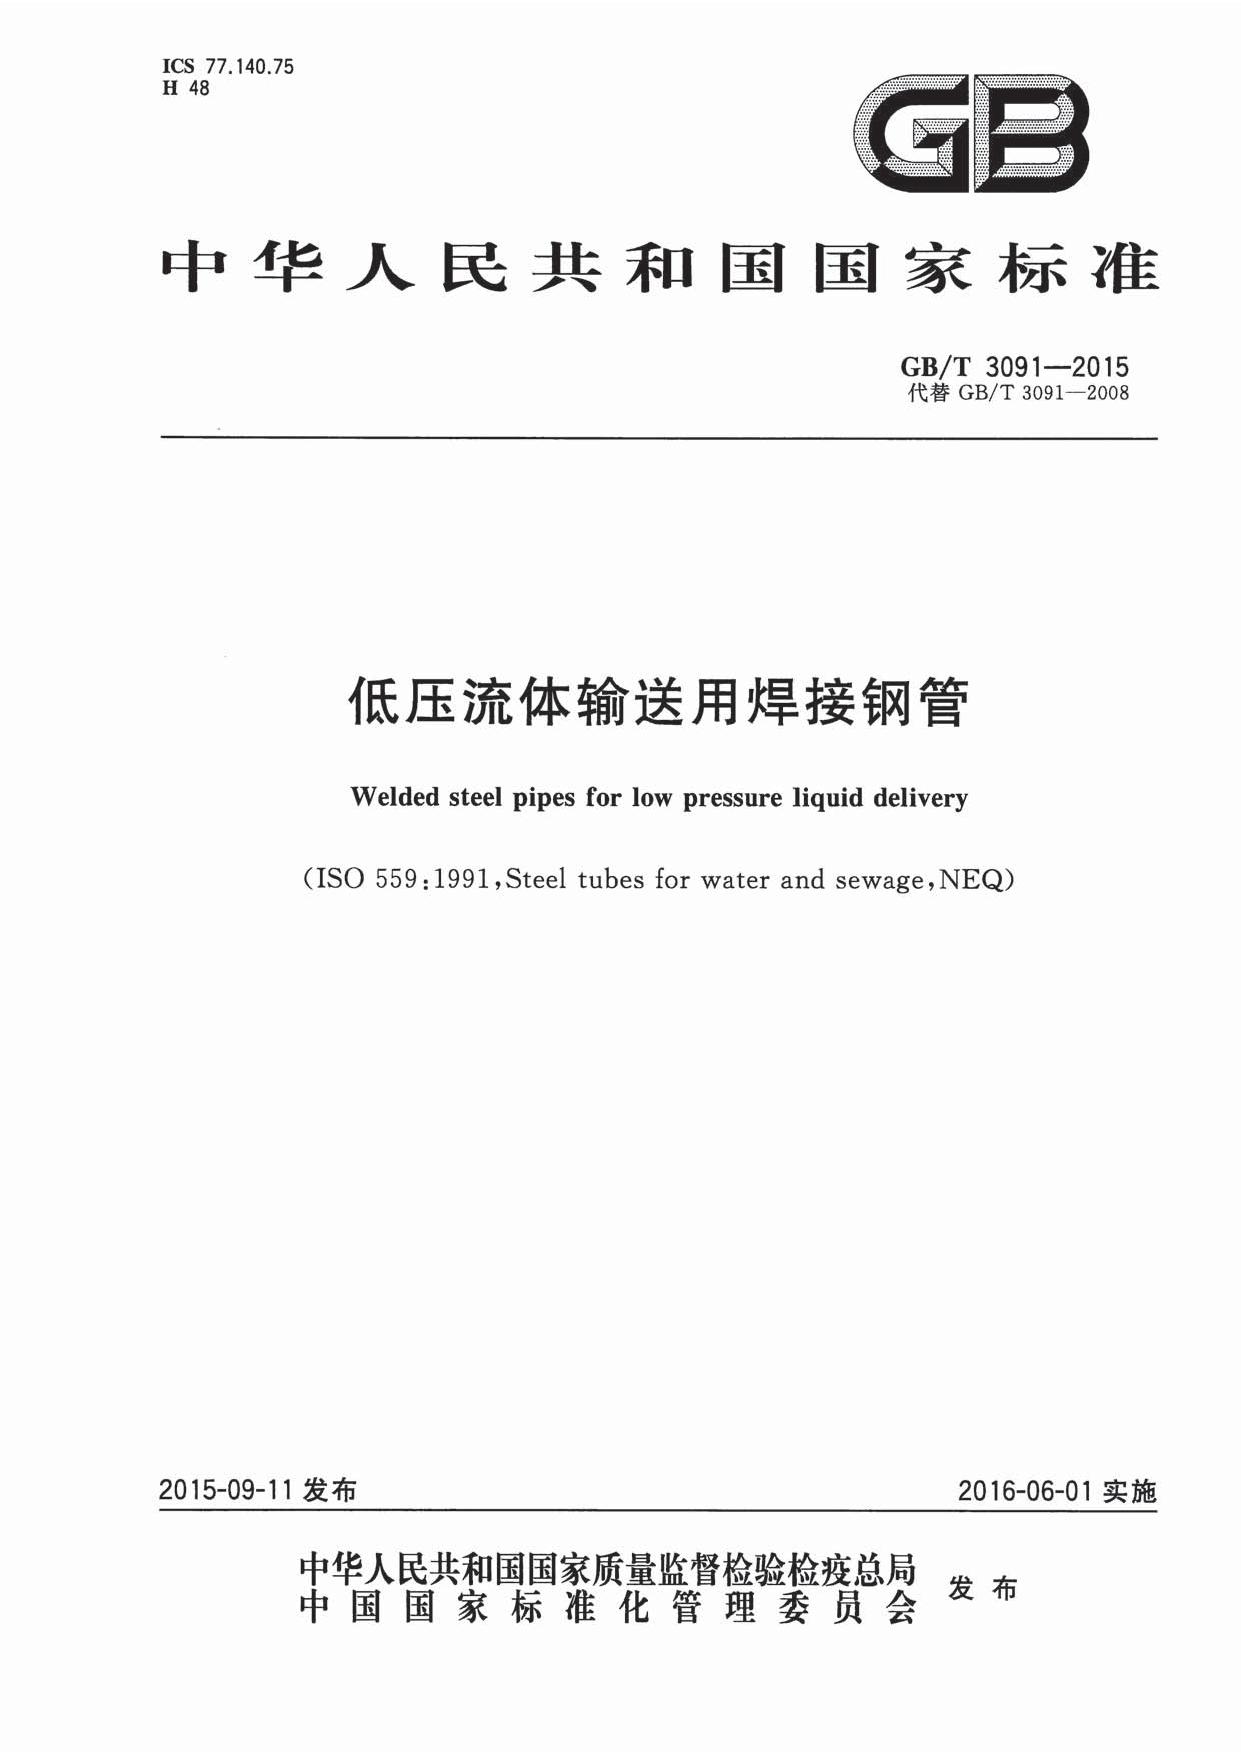 GB/T 3091-2015标准下载